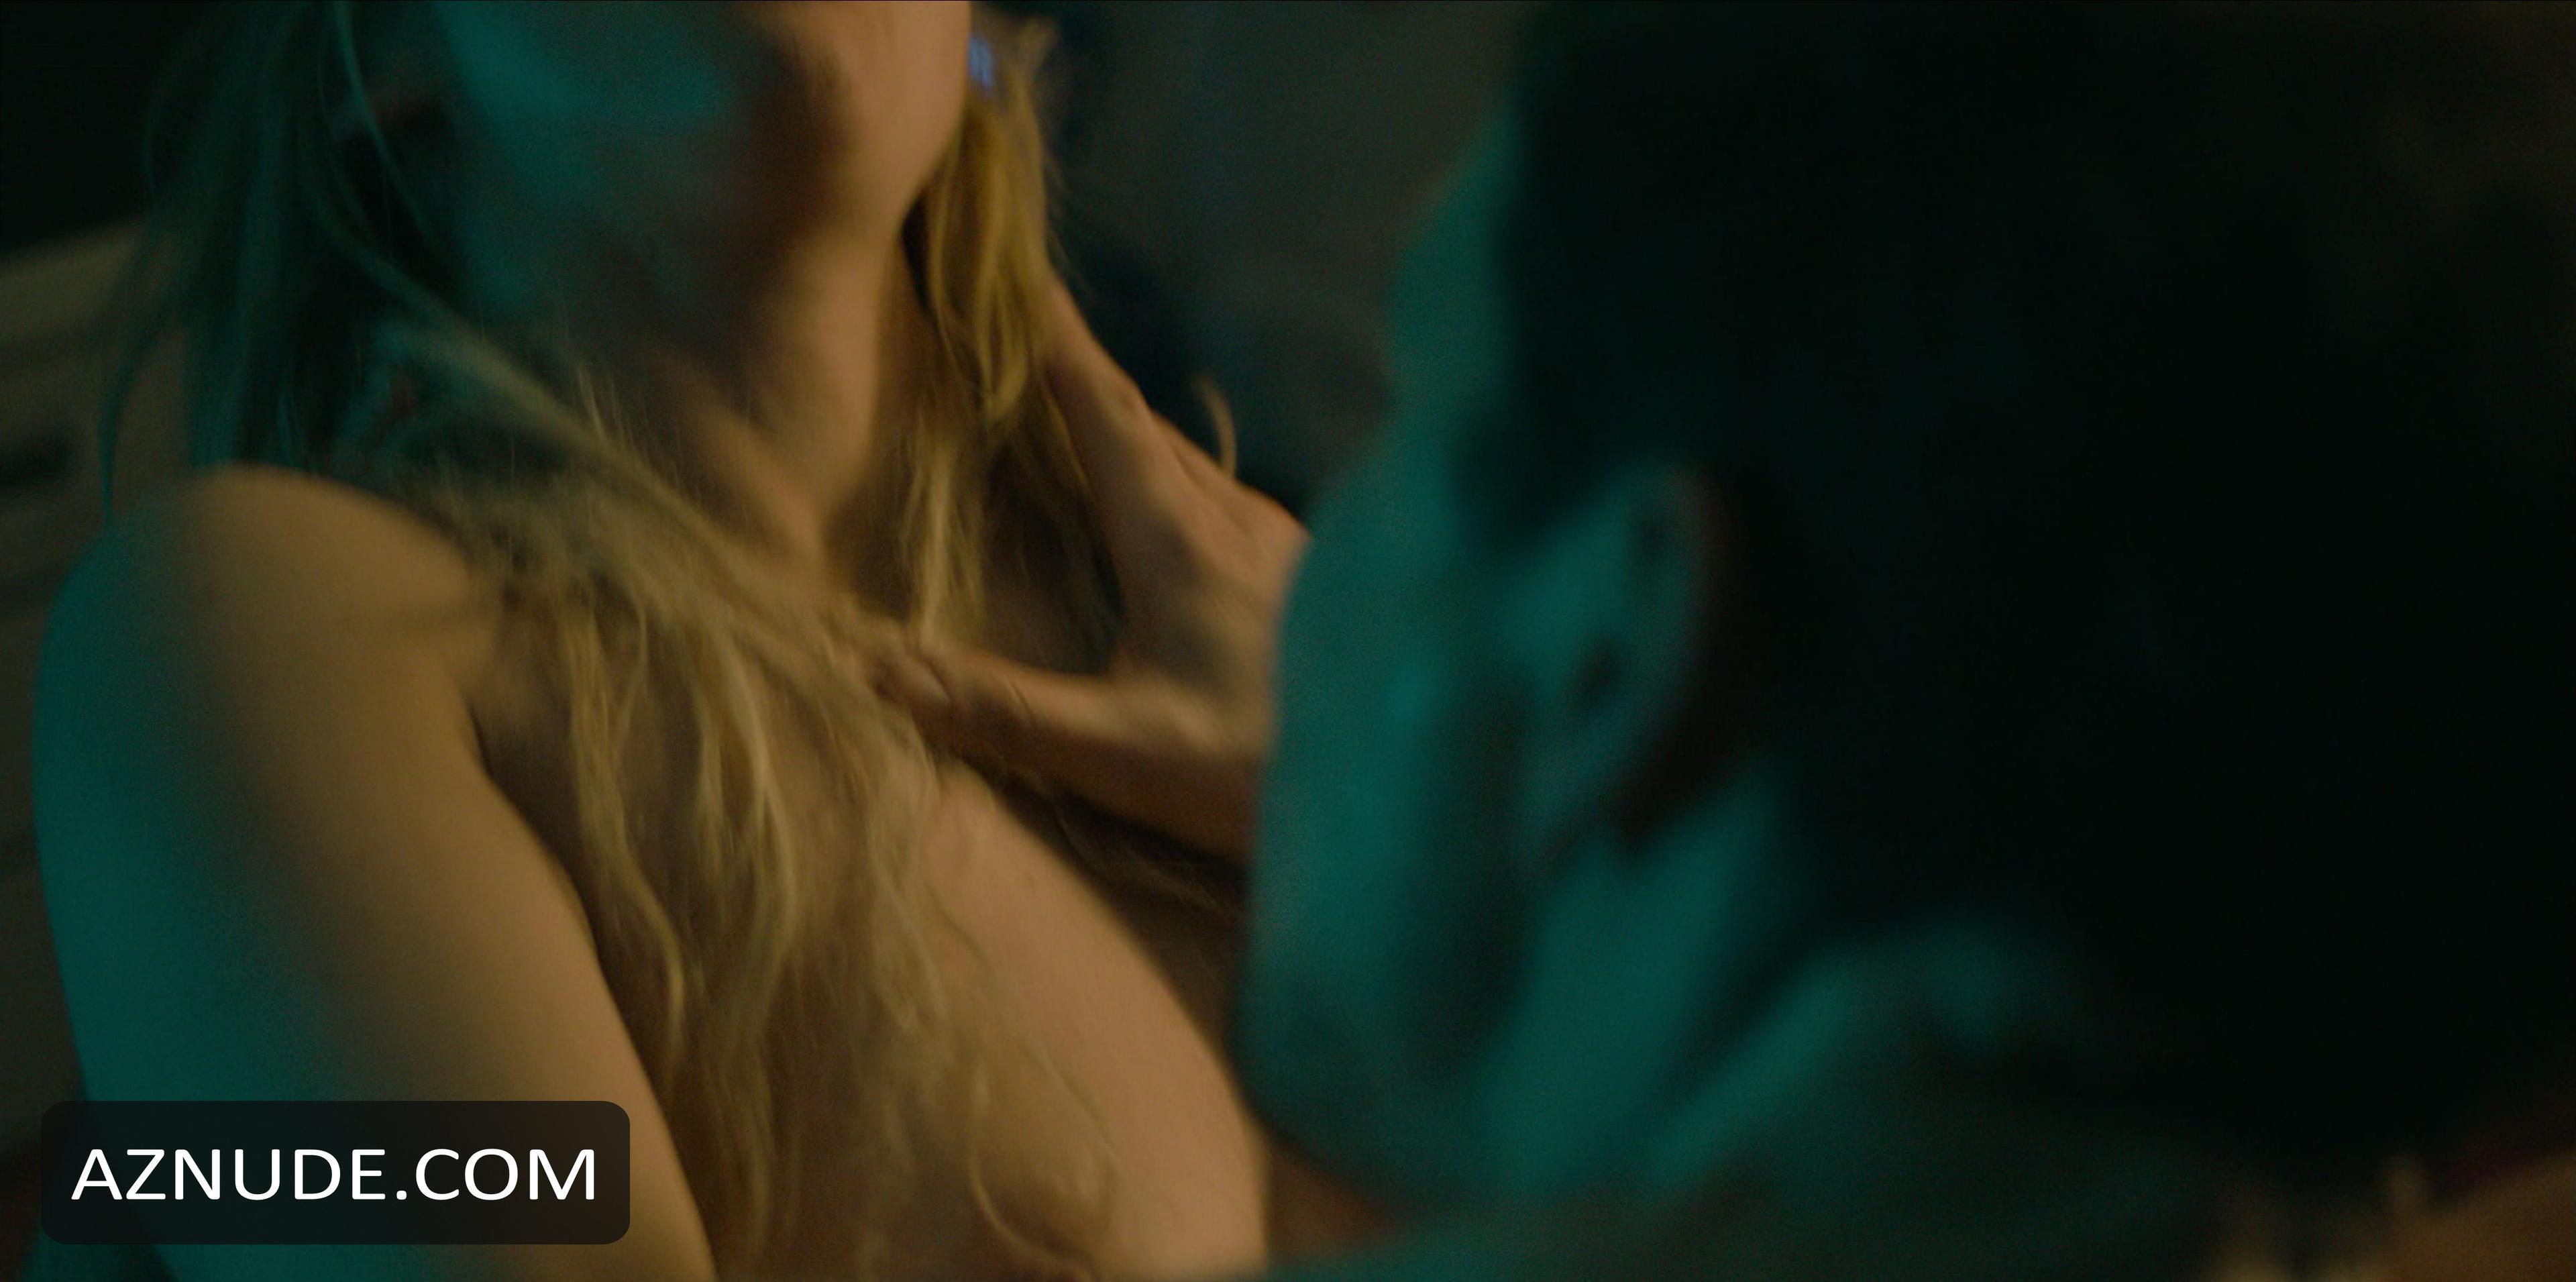 Valerie Fox Pornos & Sexfilme Kostenlos - FRAUPORNO